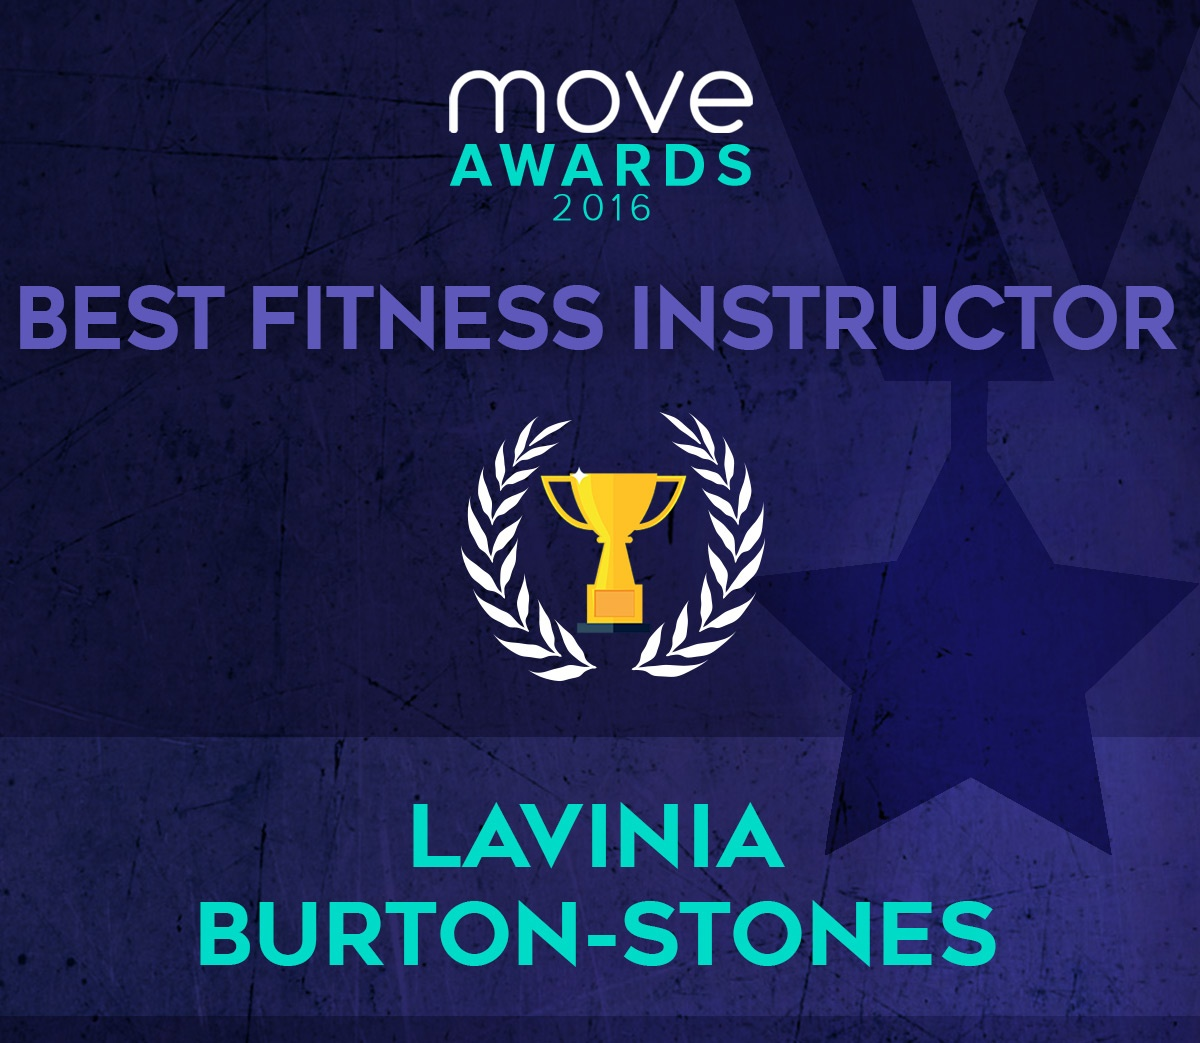 Best-Fitness-Instructor-Leeds-.jpg